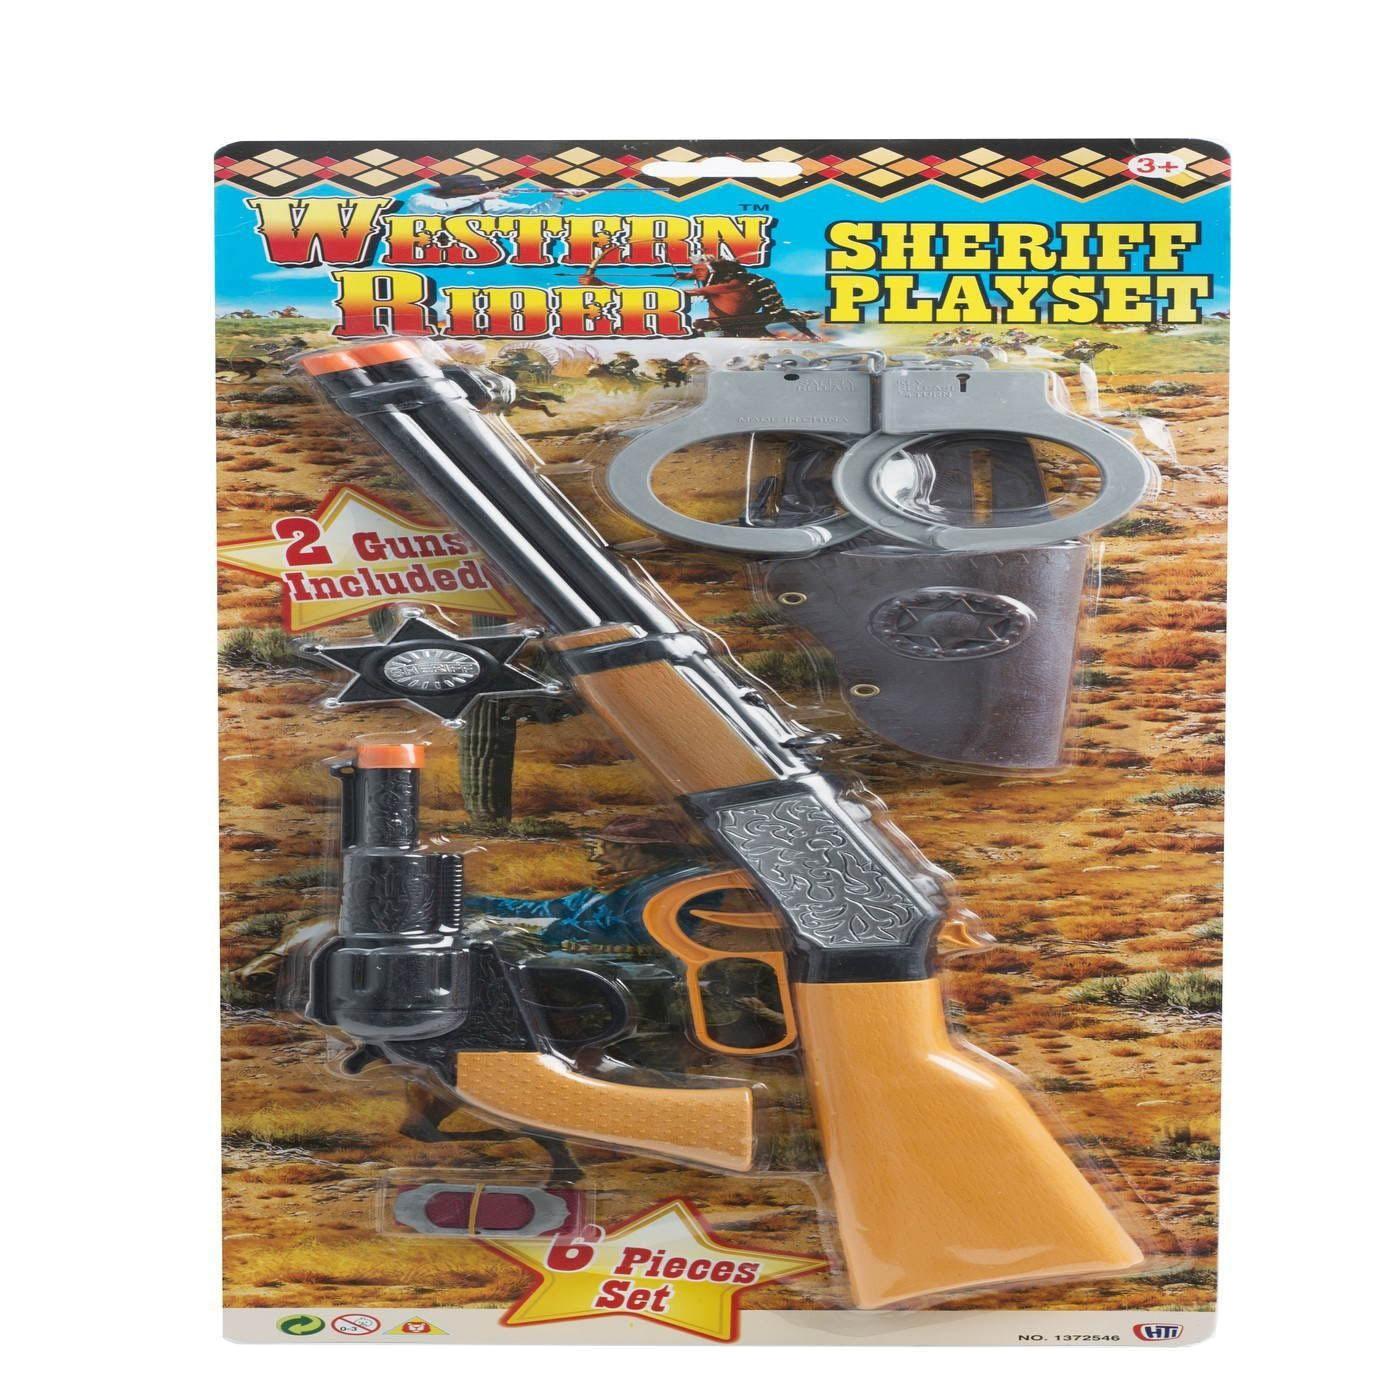 SHERIFF PLAY SET